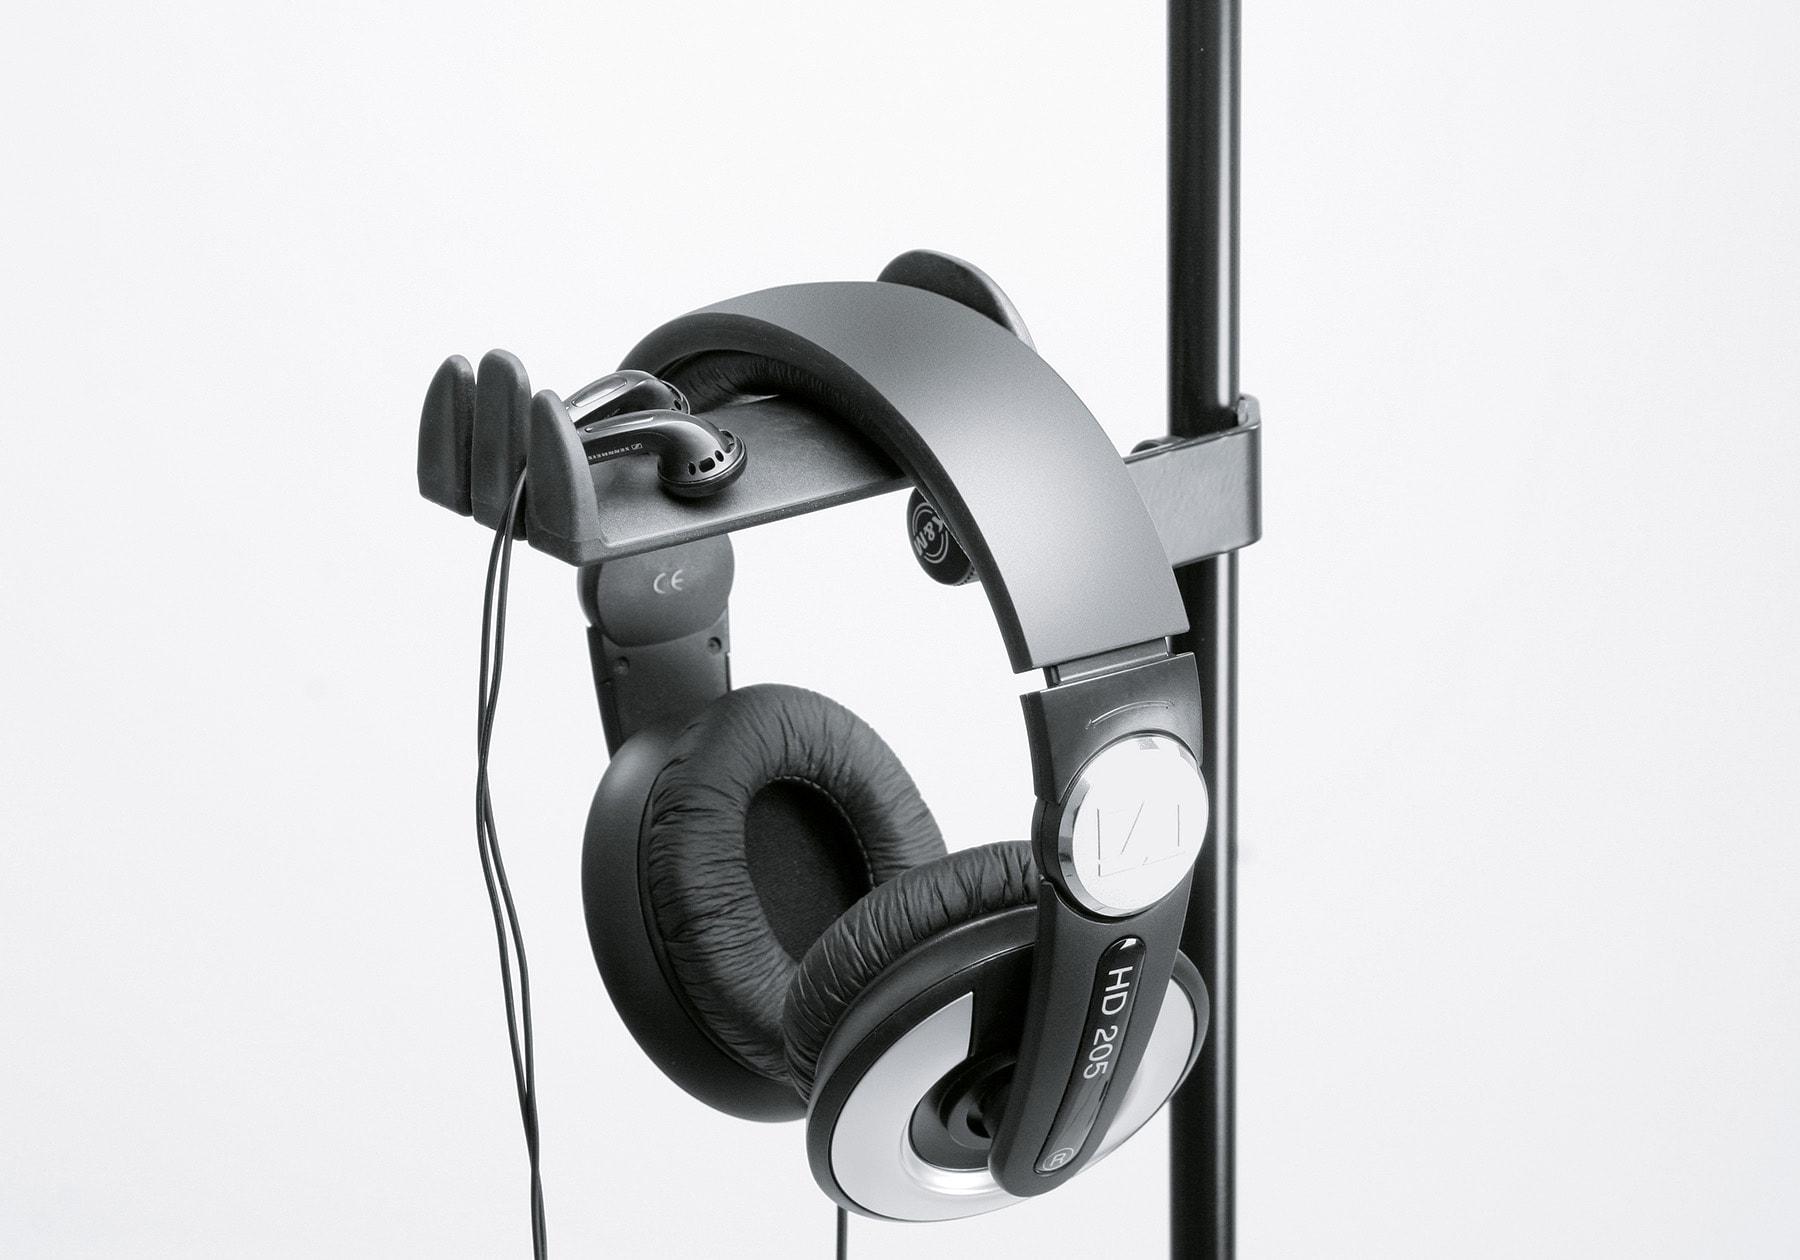 KM16080 - Headphone holder